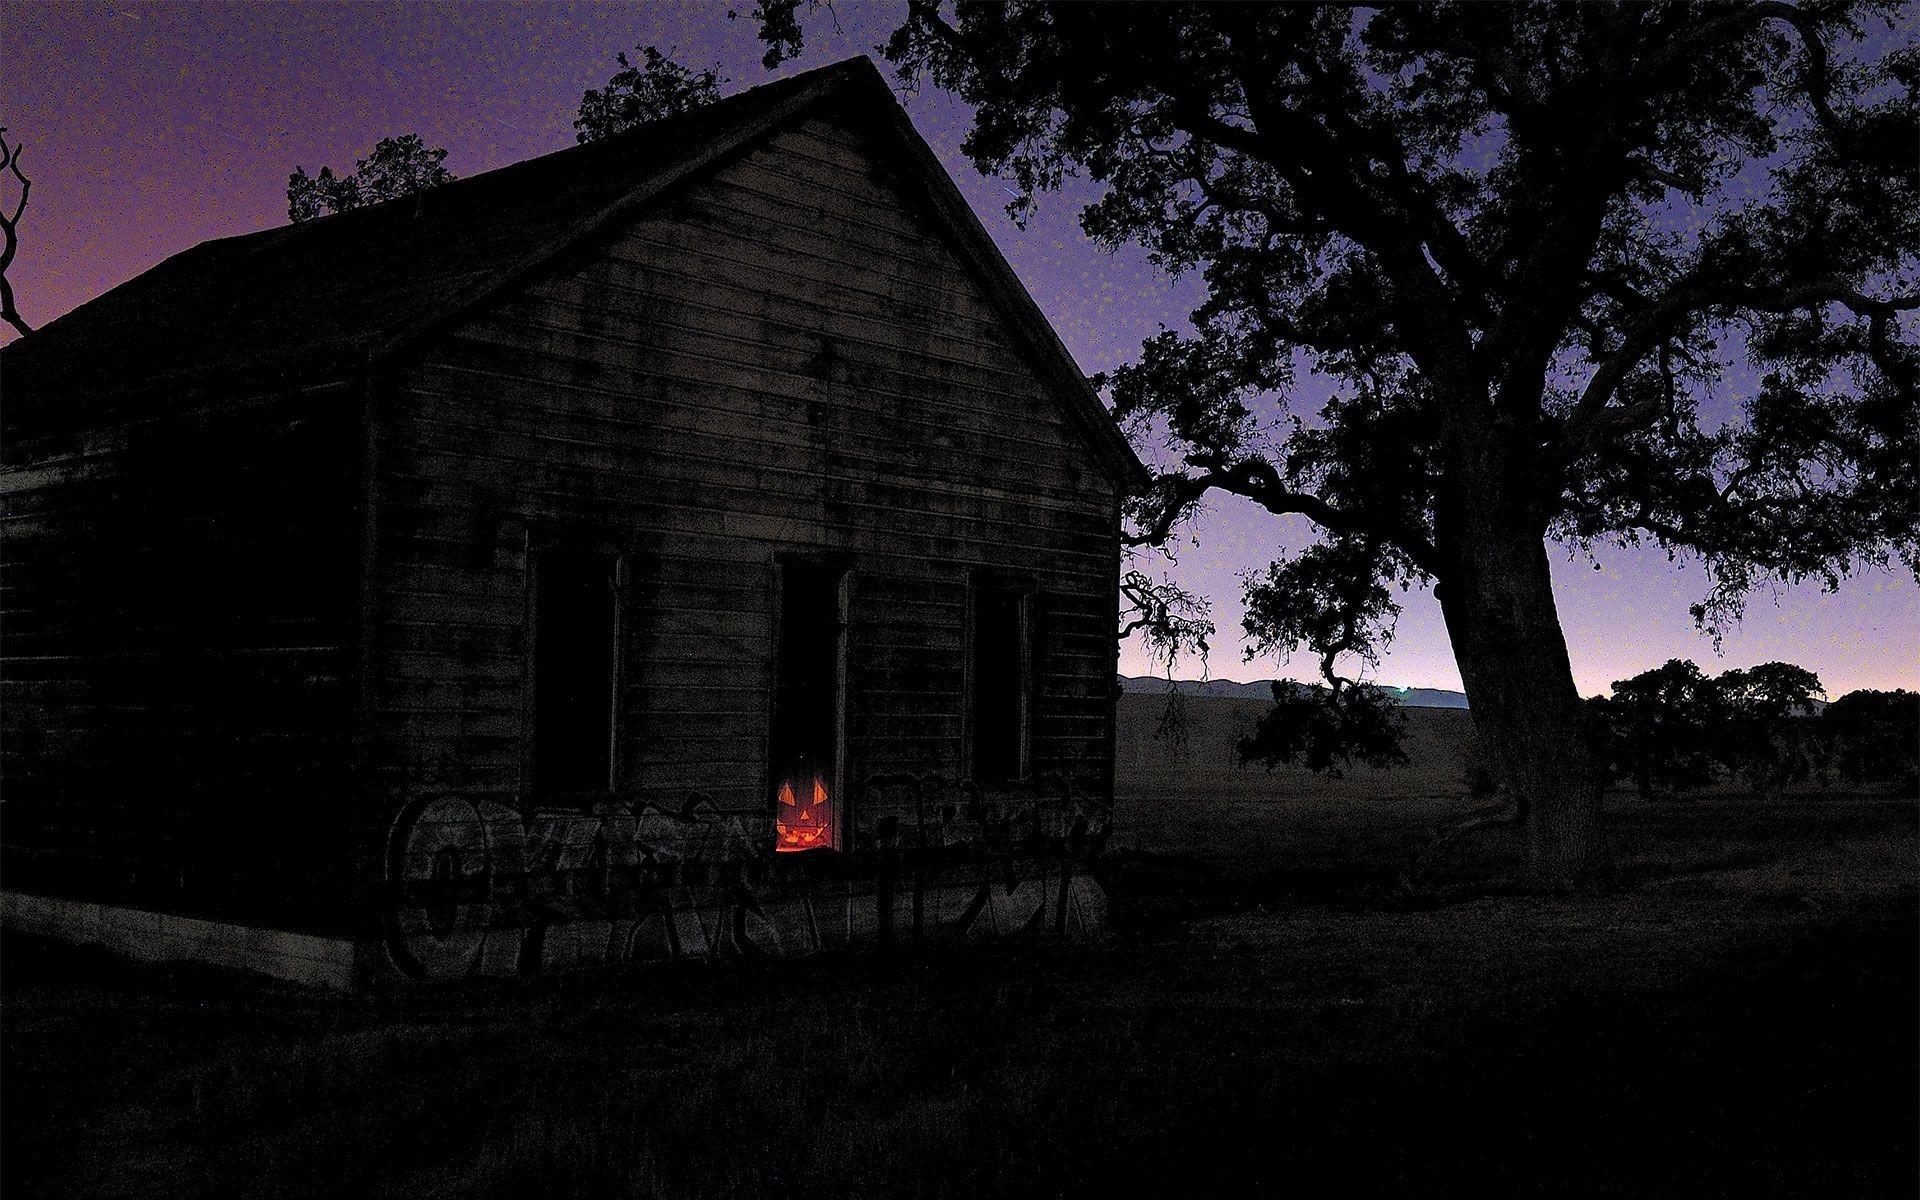 1920x1200 House Creepy Halloween Haunted Lights Windows Wallpaper At Dark Wallpapers